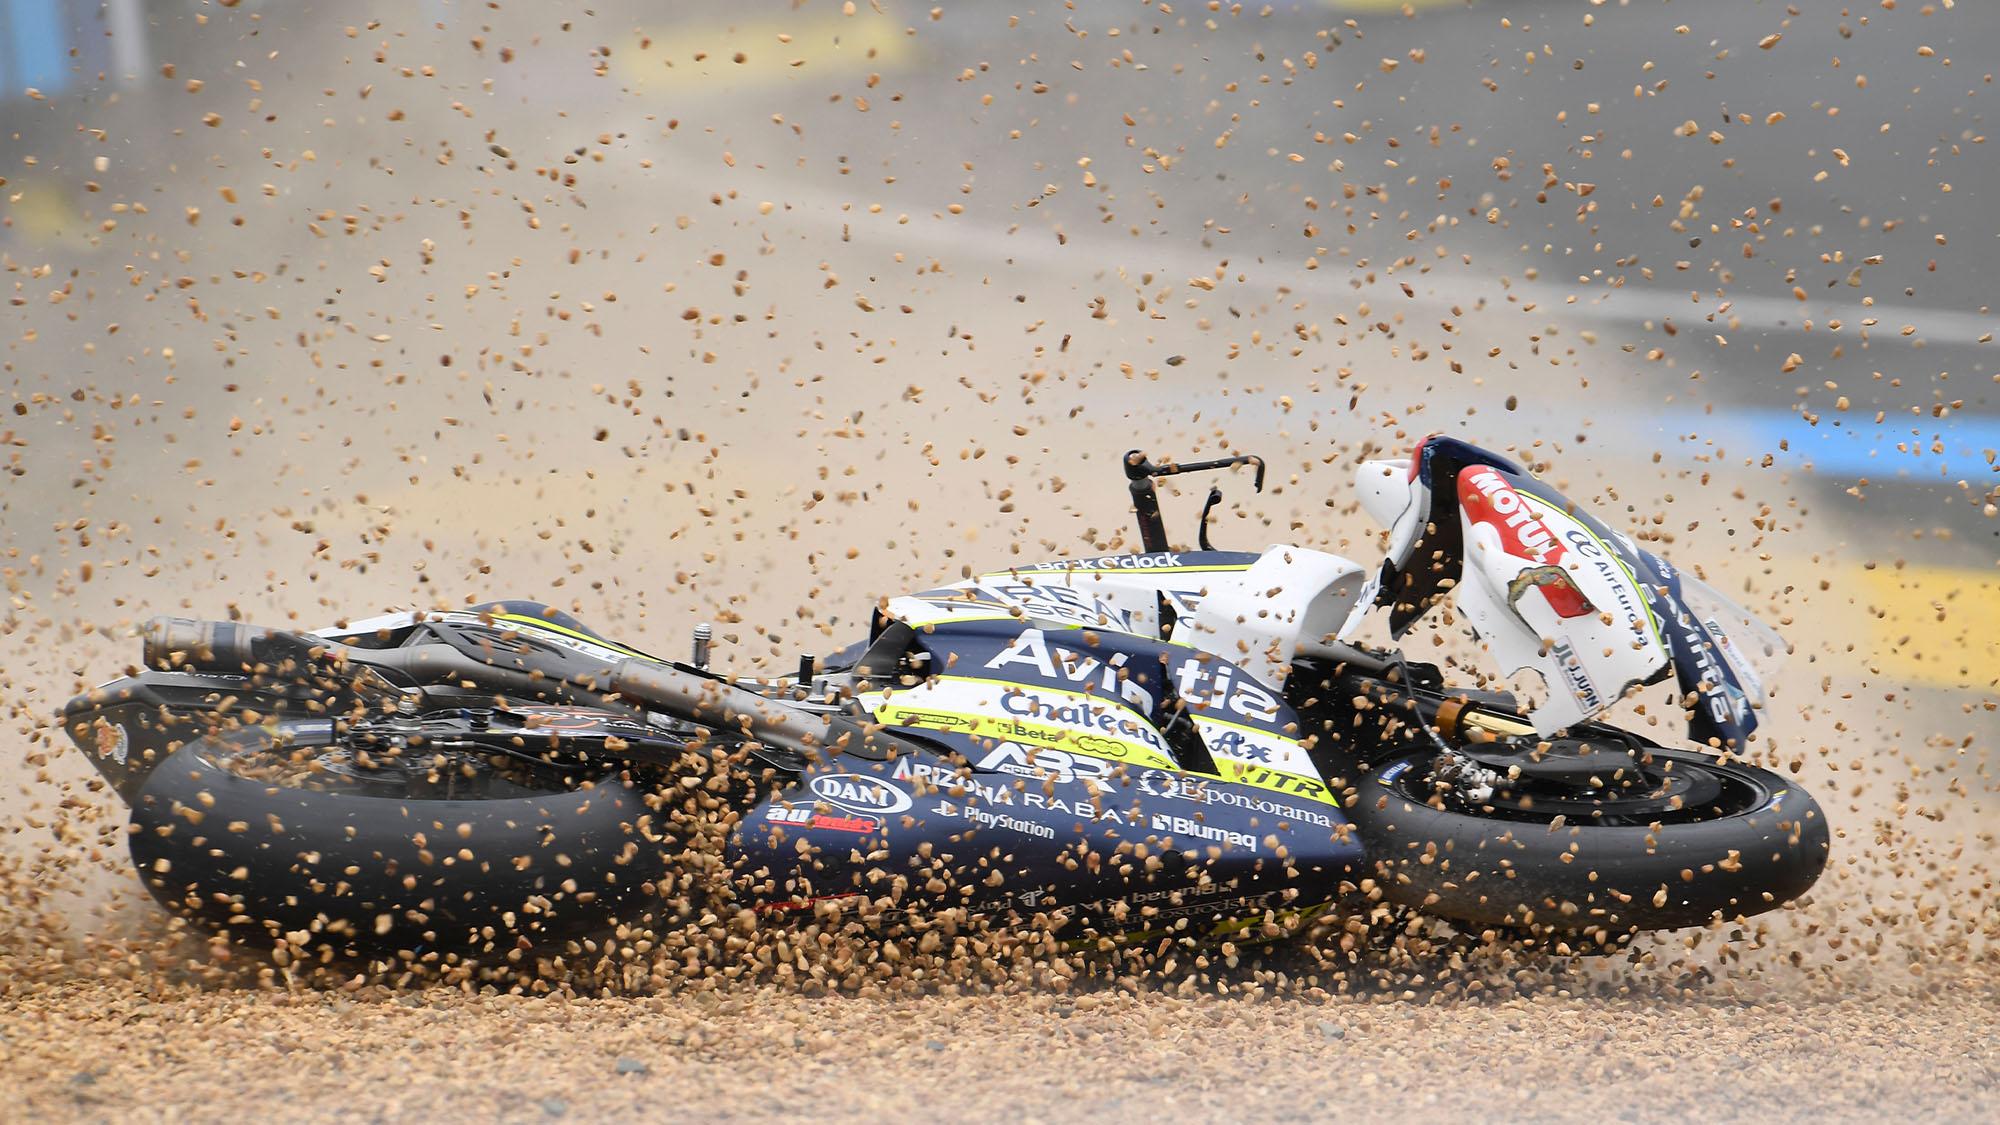 2019 first lap MotoGP crash at Le Mans Turn Three